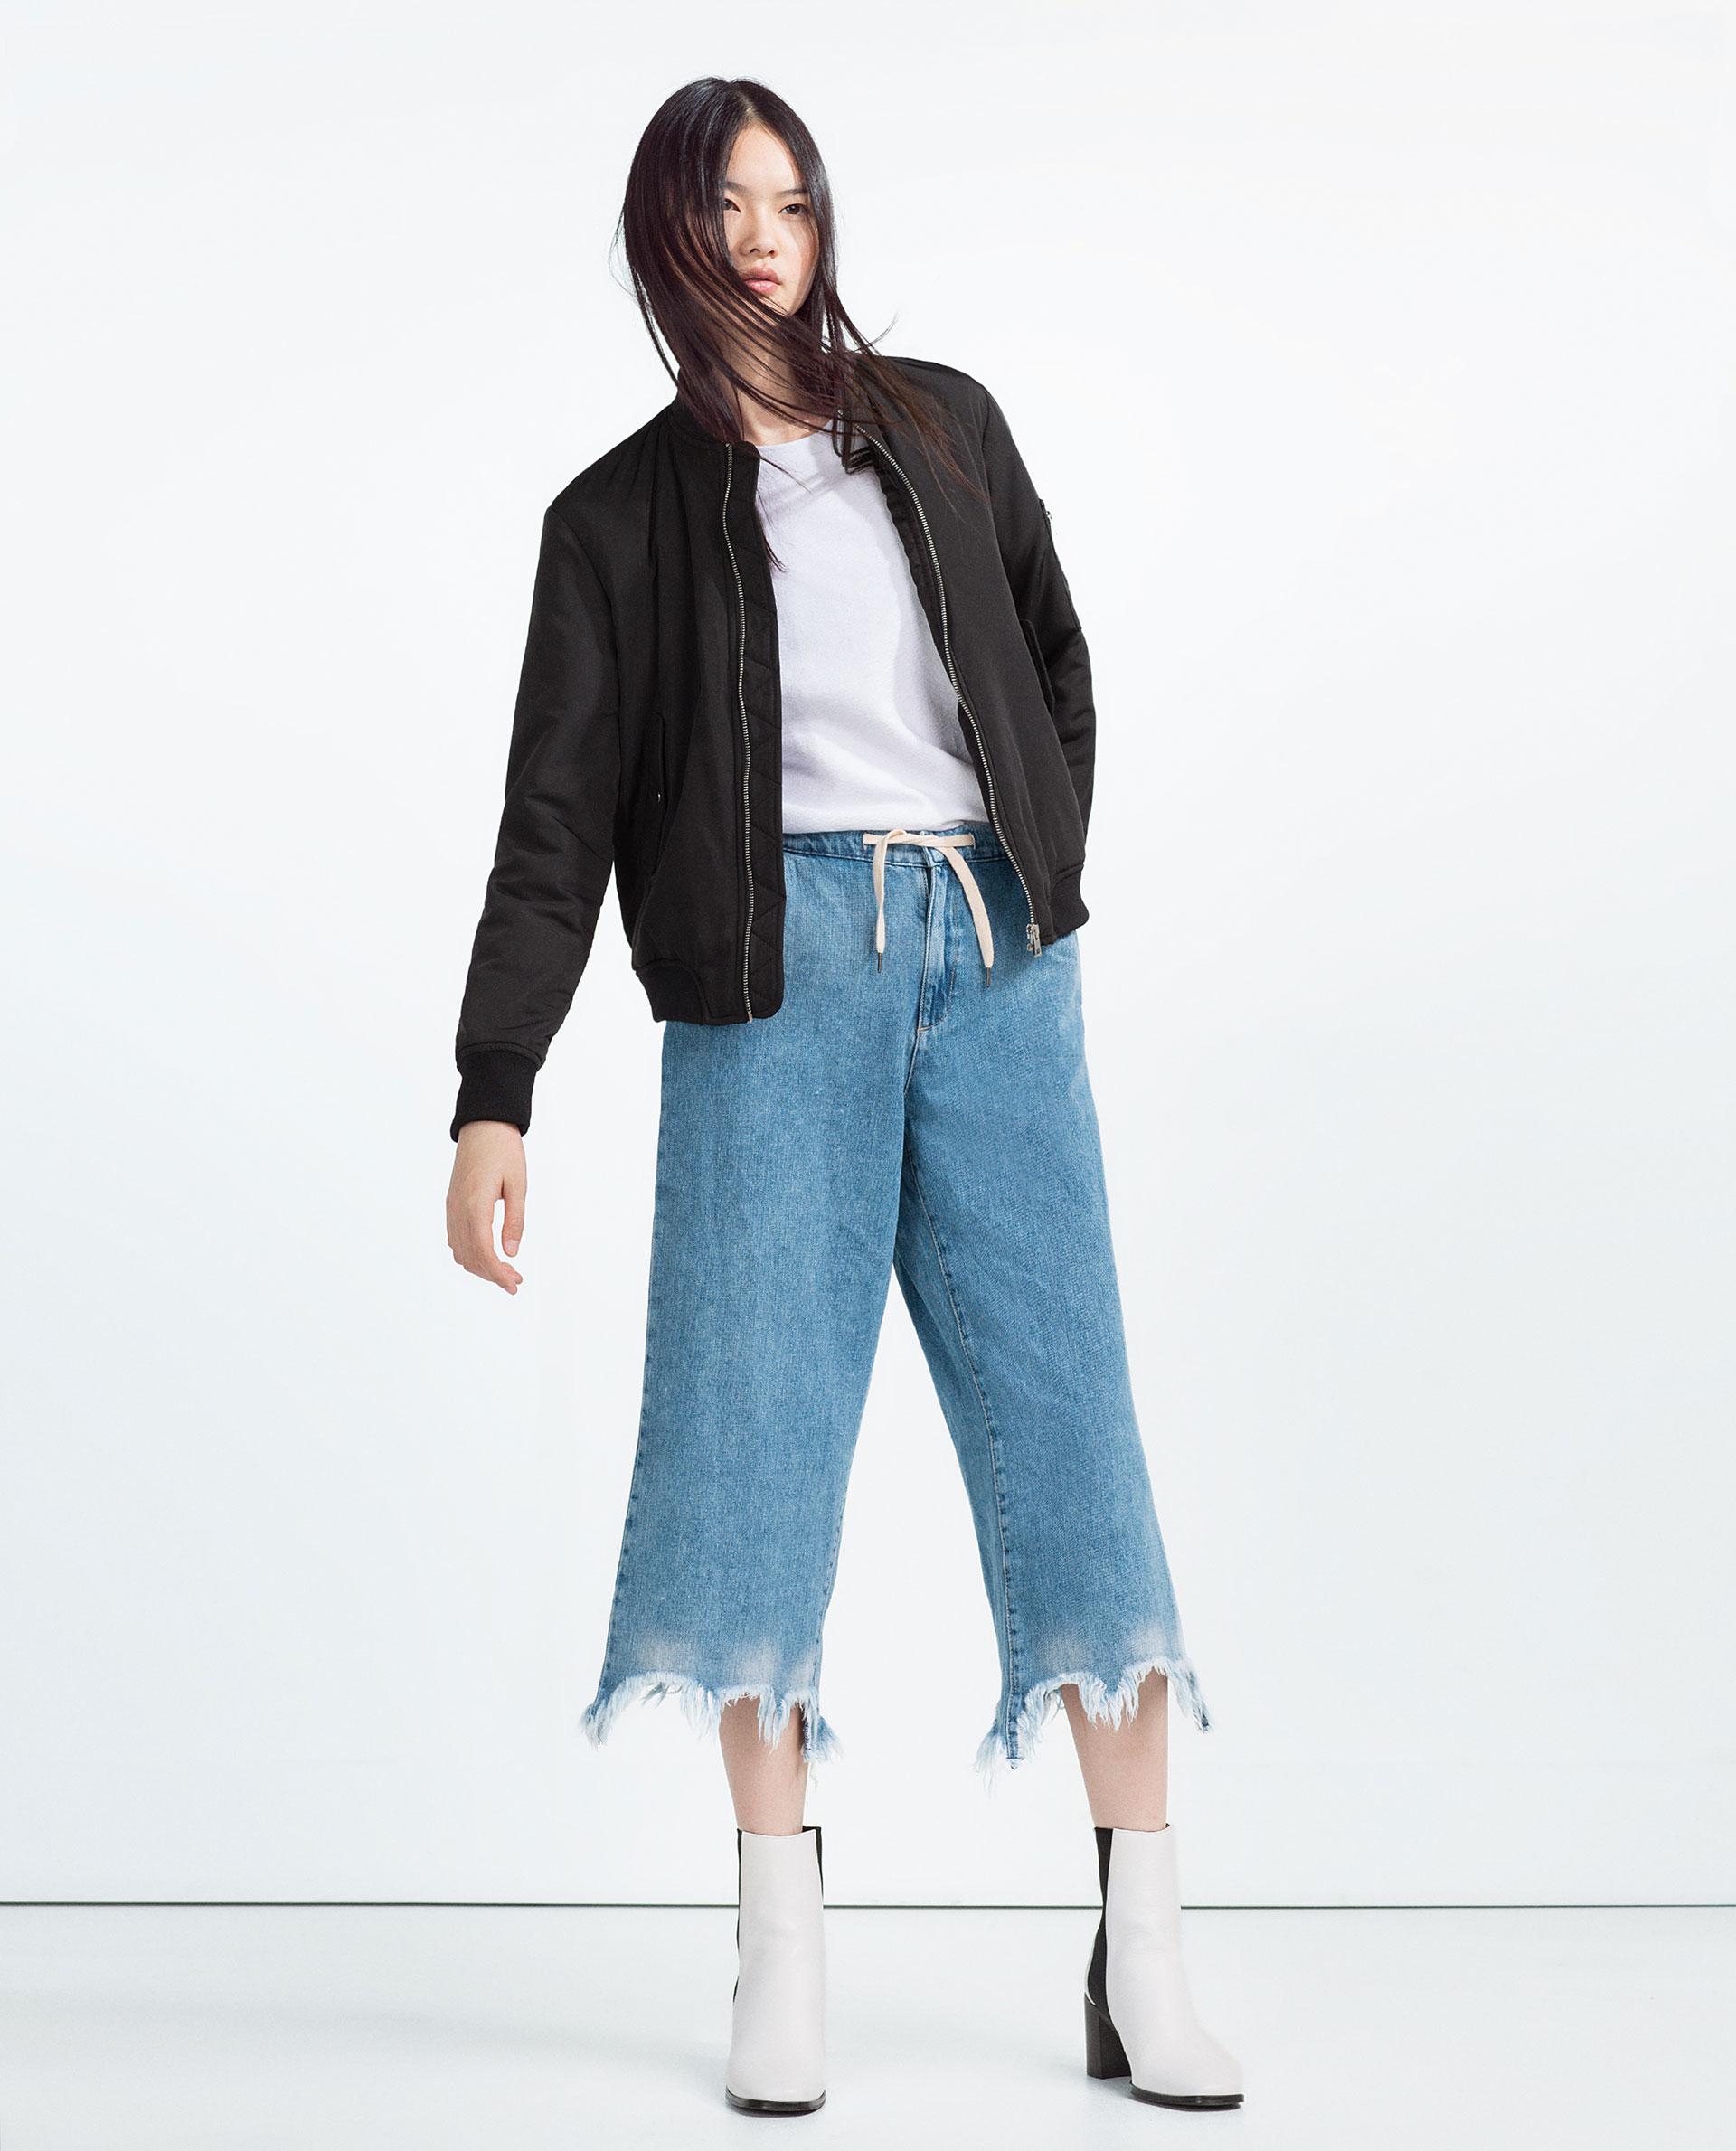 Zara Nylon Bomber Jacket In Black | Lyst